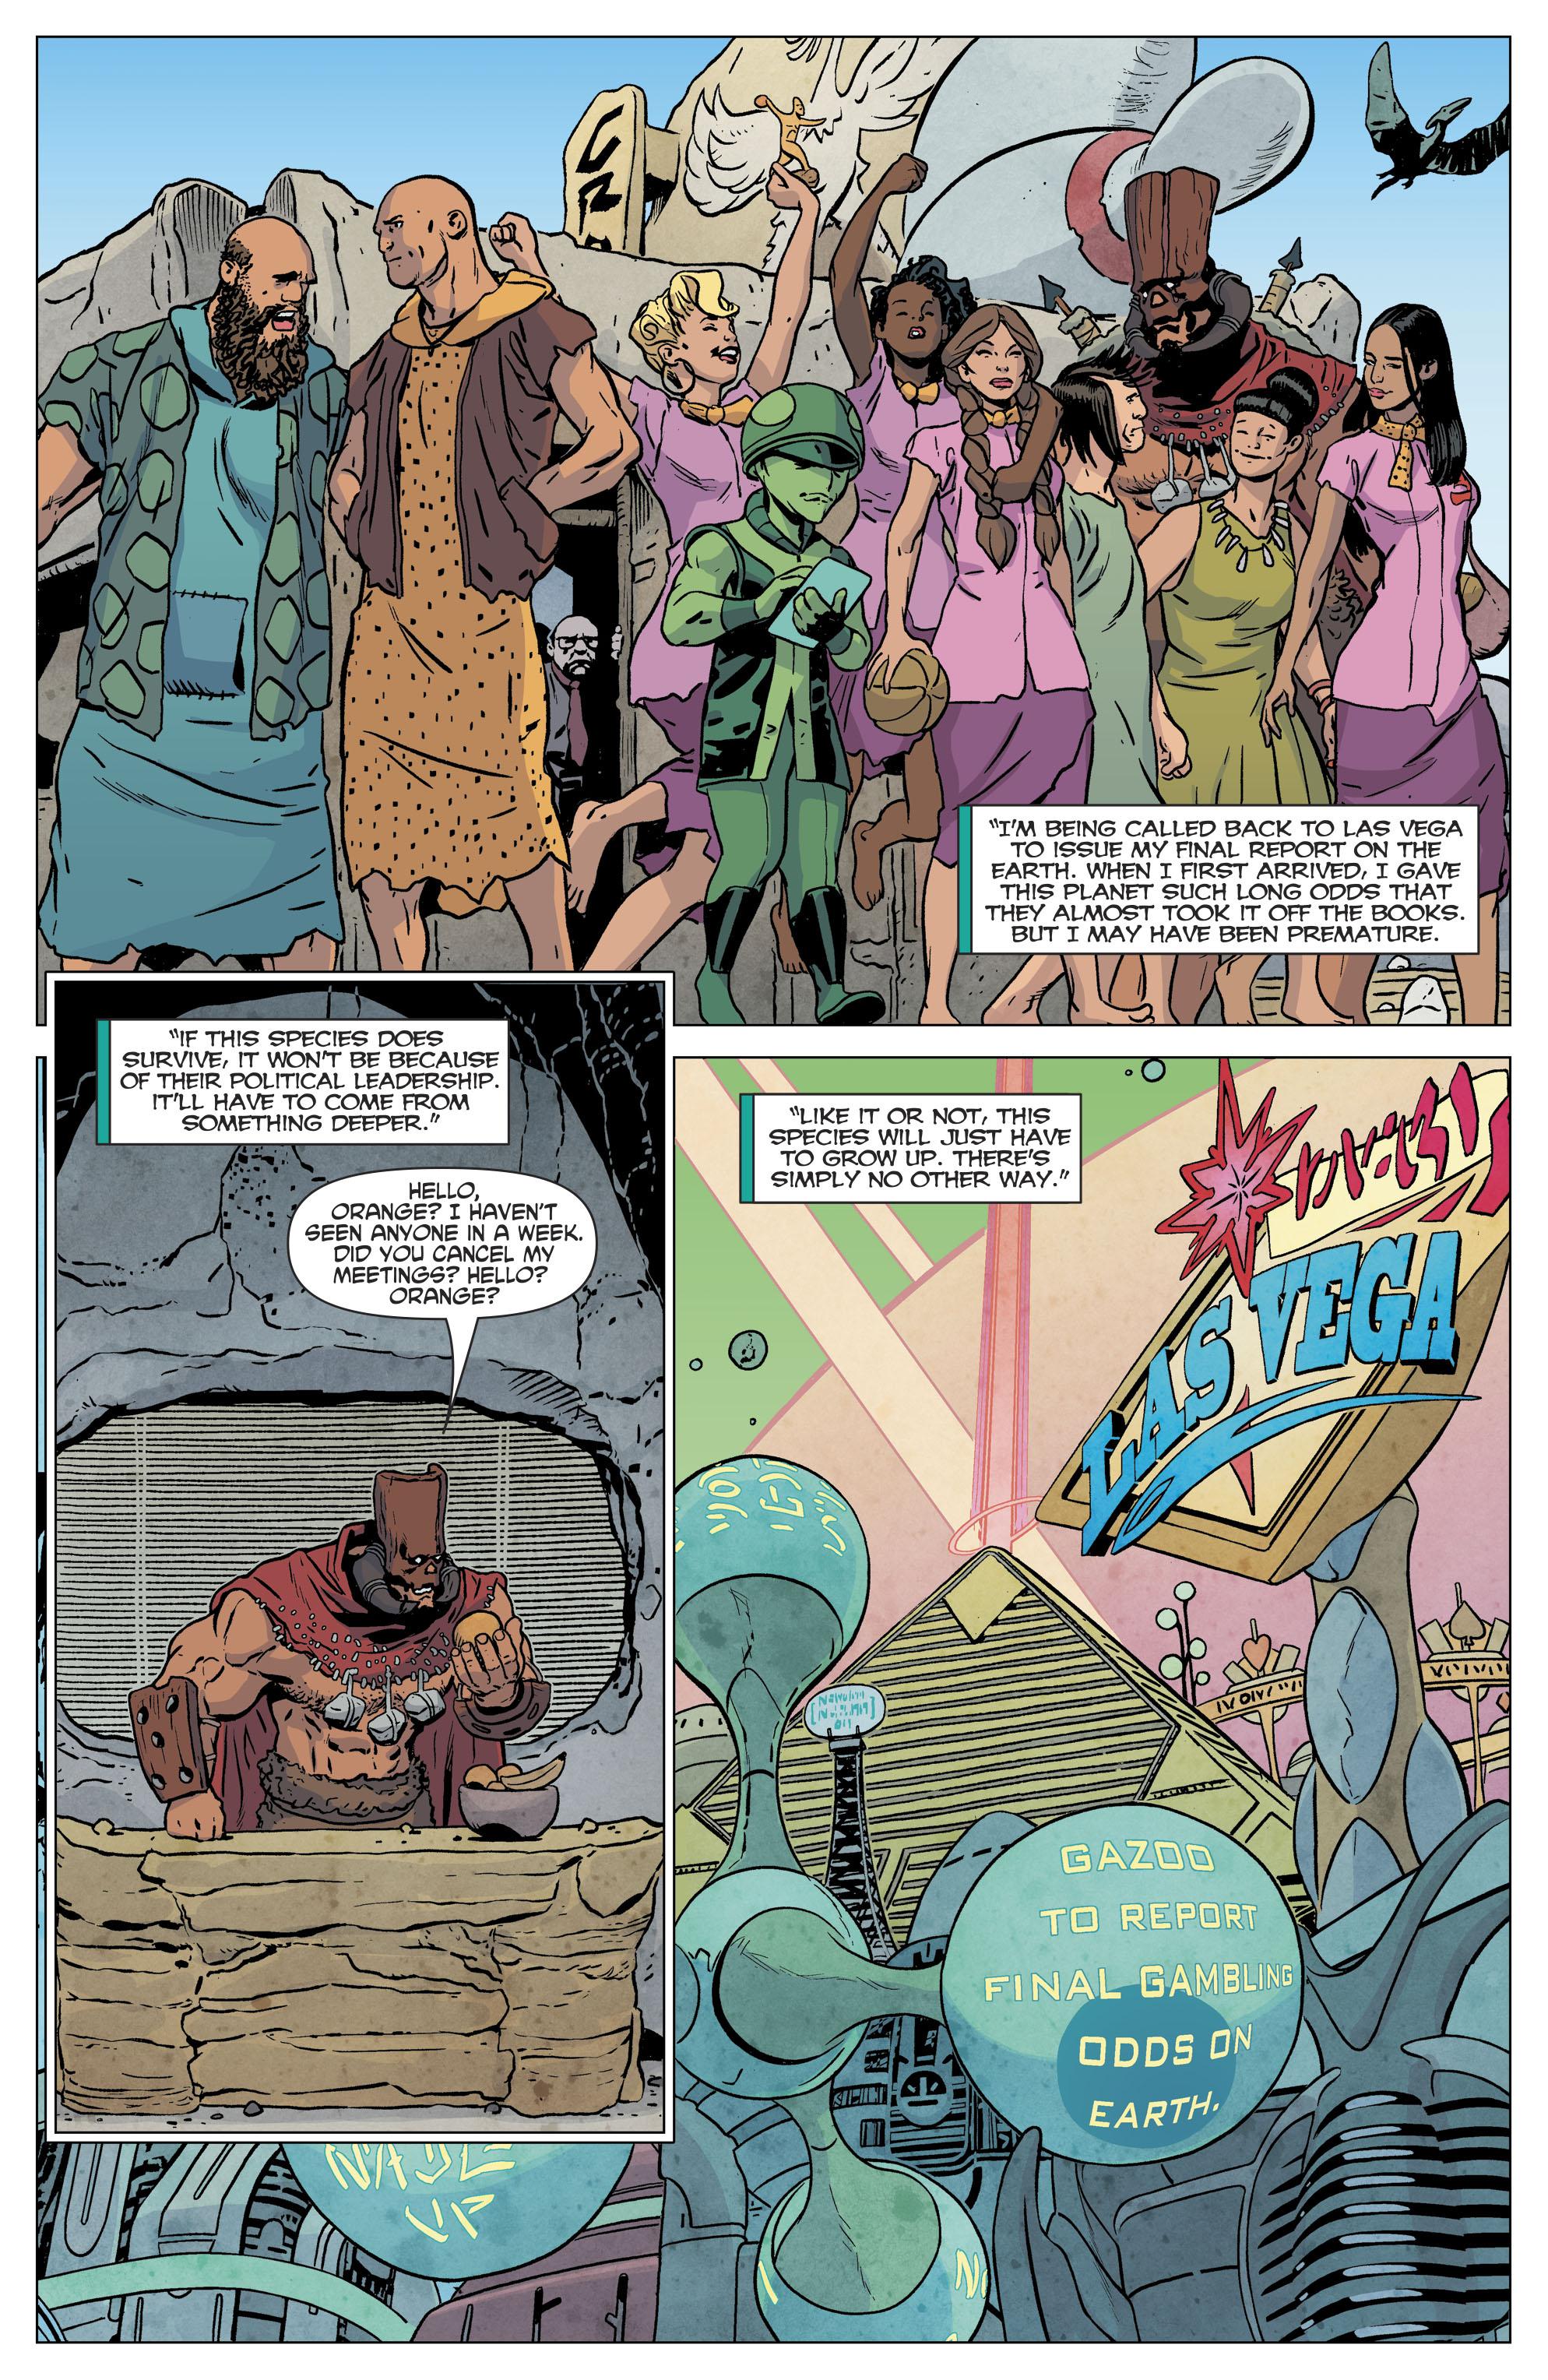 Read online The Flintstones comic -  Issue #12 - 17